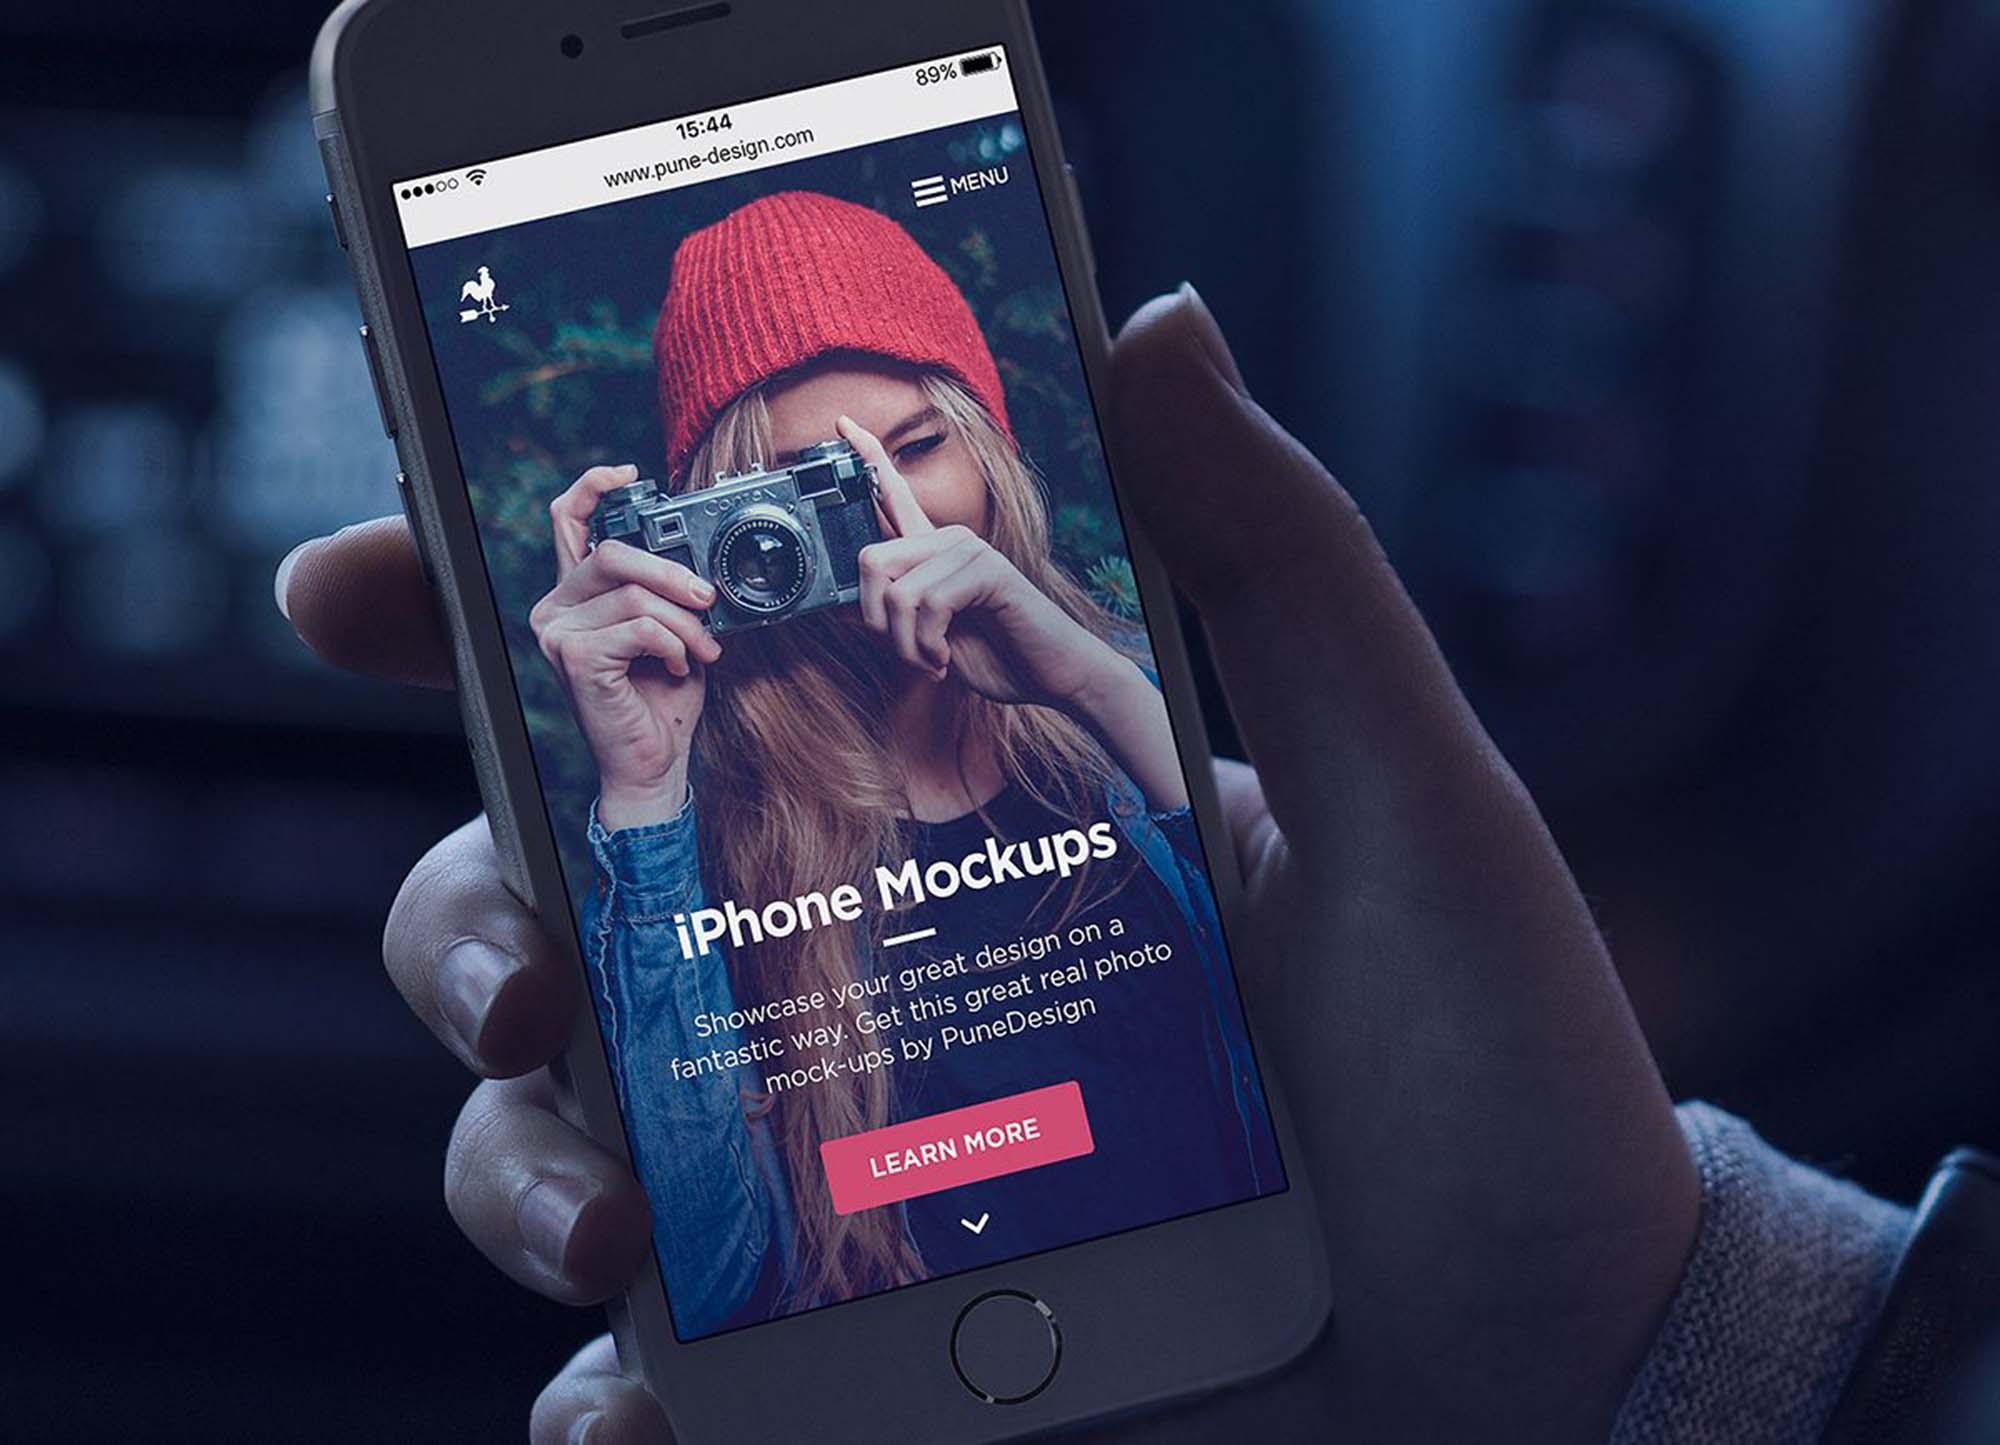 Photorealistic iPhone Mockup